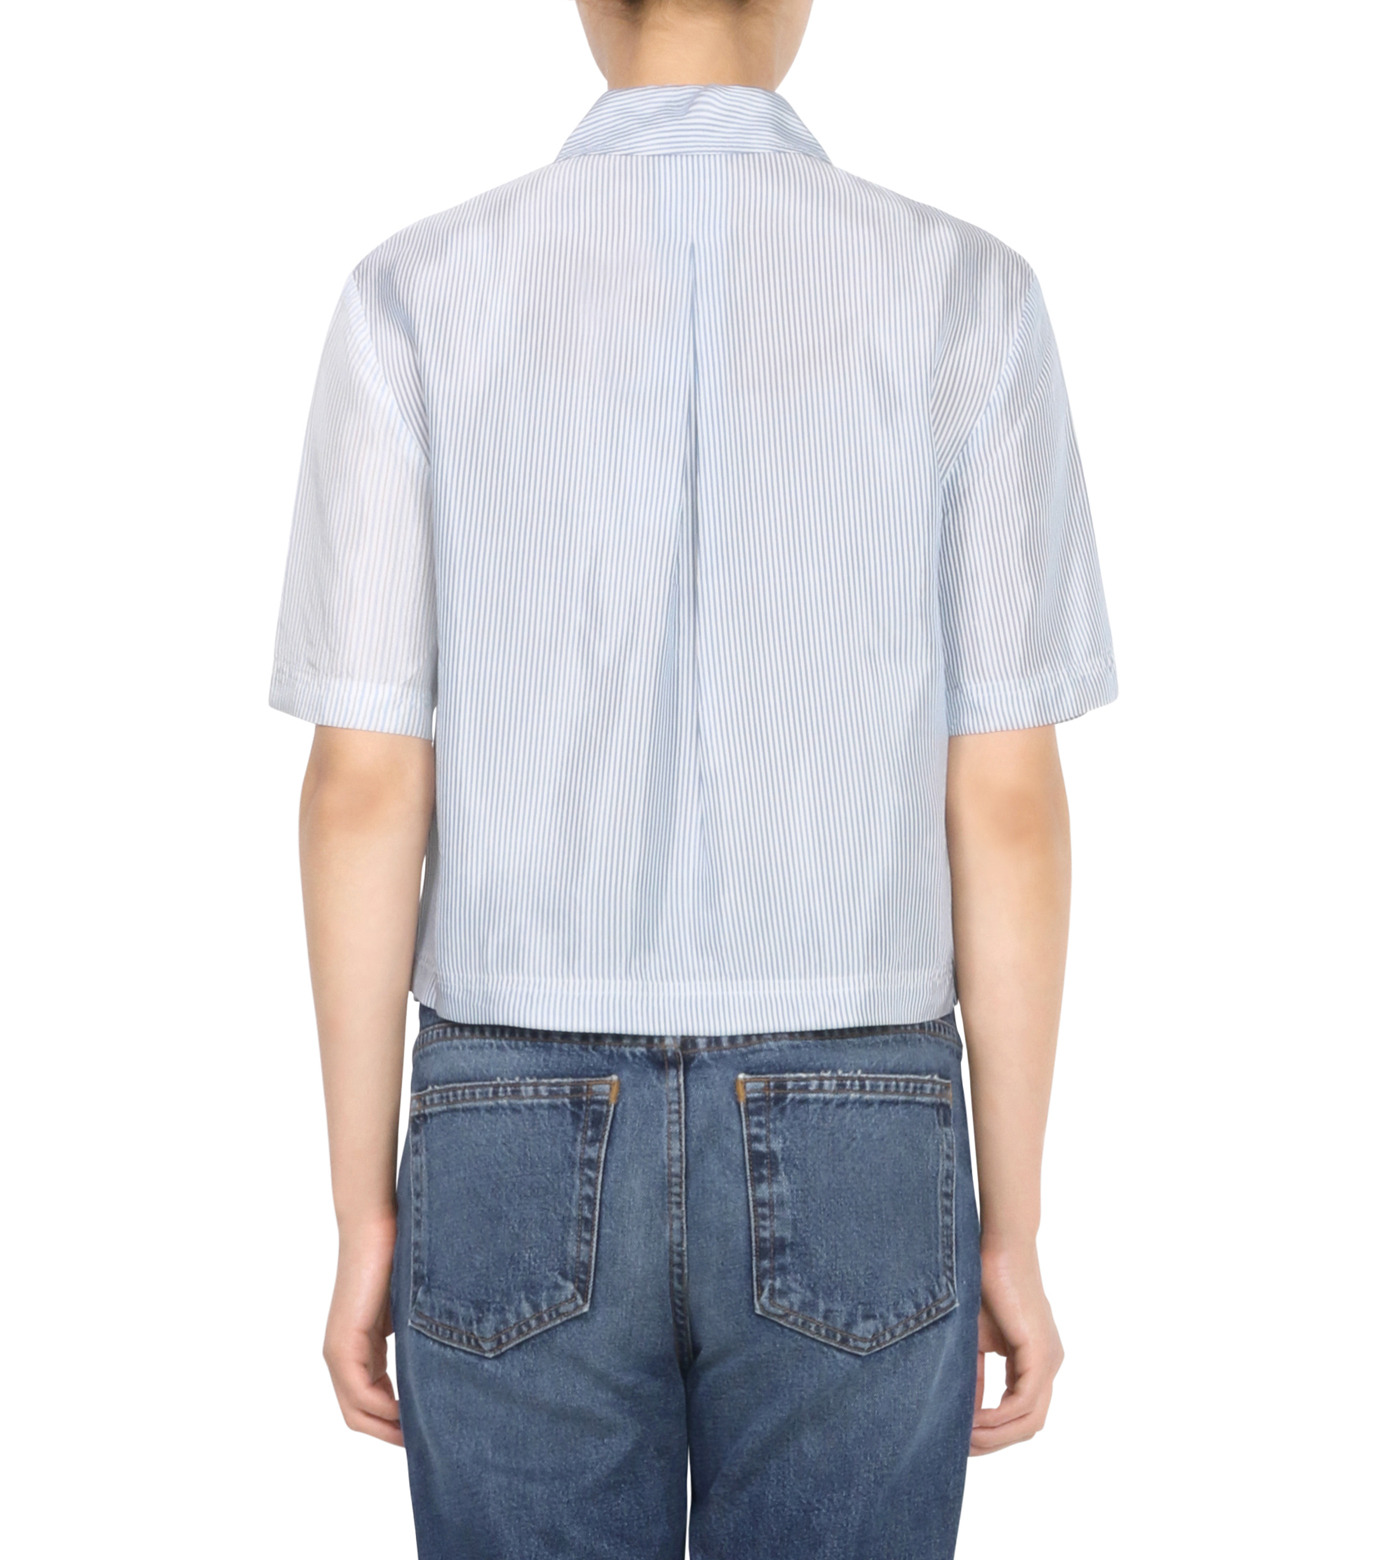 T by Alexander Wang(ティーバイ アレキサンダーワン)のWashed Stripe SS Shirt-NAVY(シャツ/shirt)-403202P16-93 拡大詳細画像2